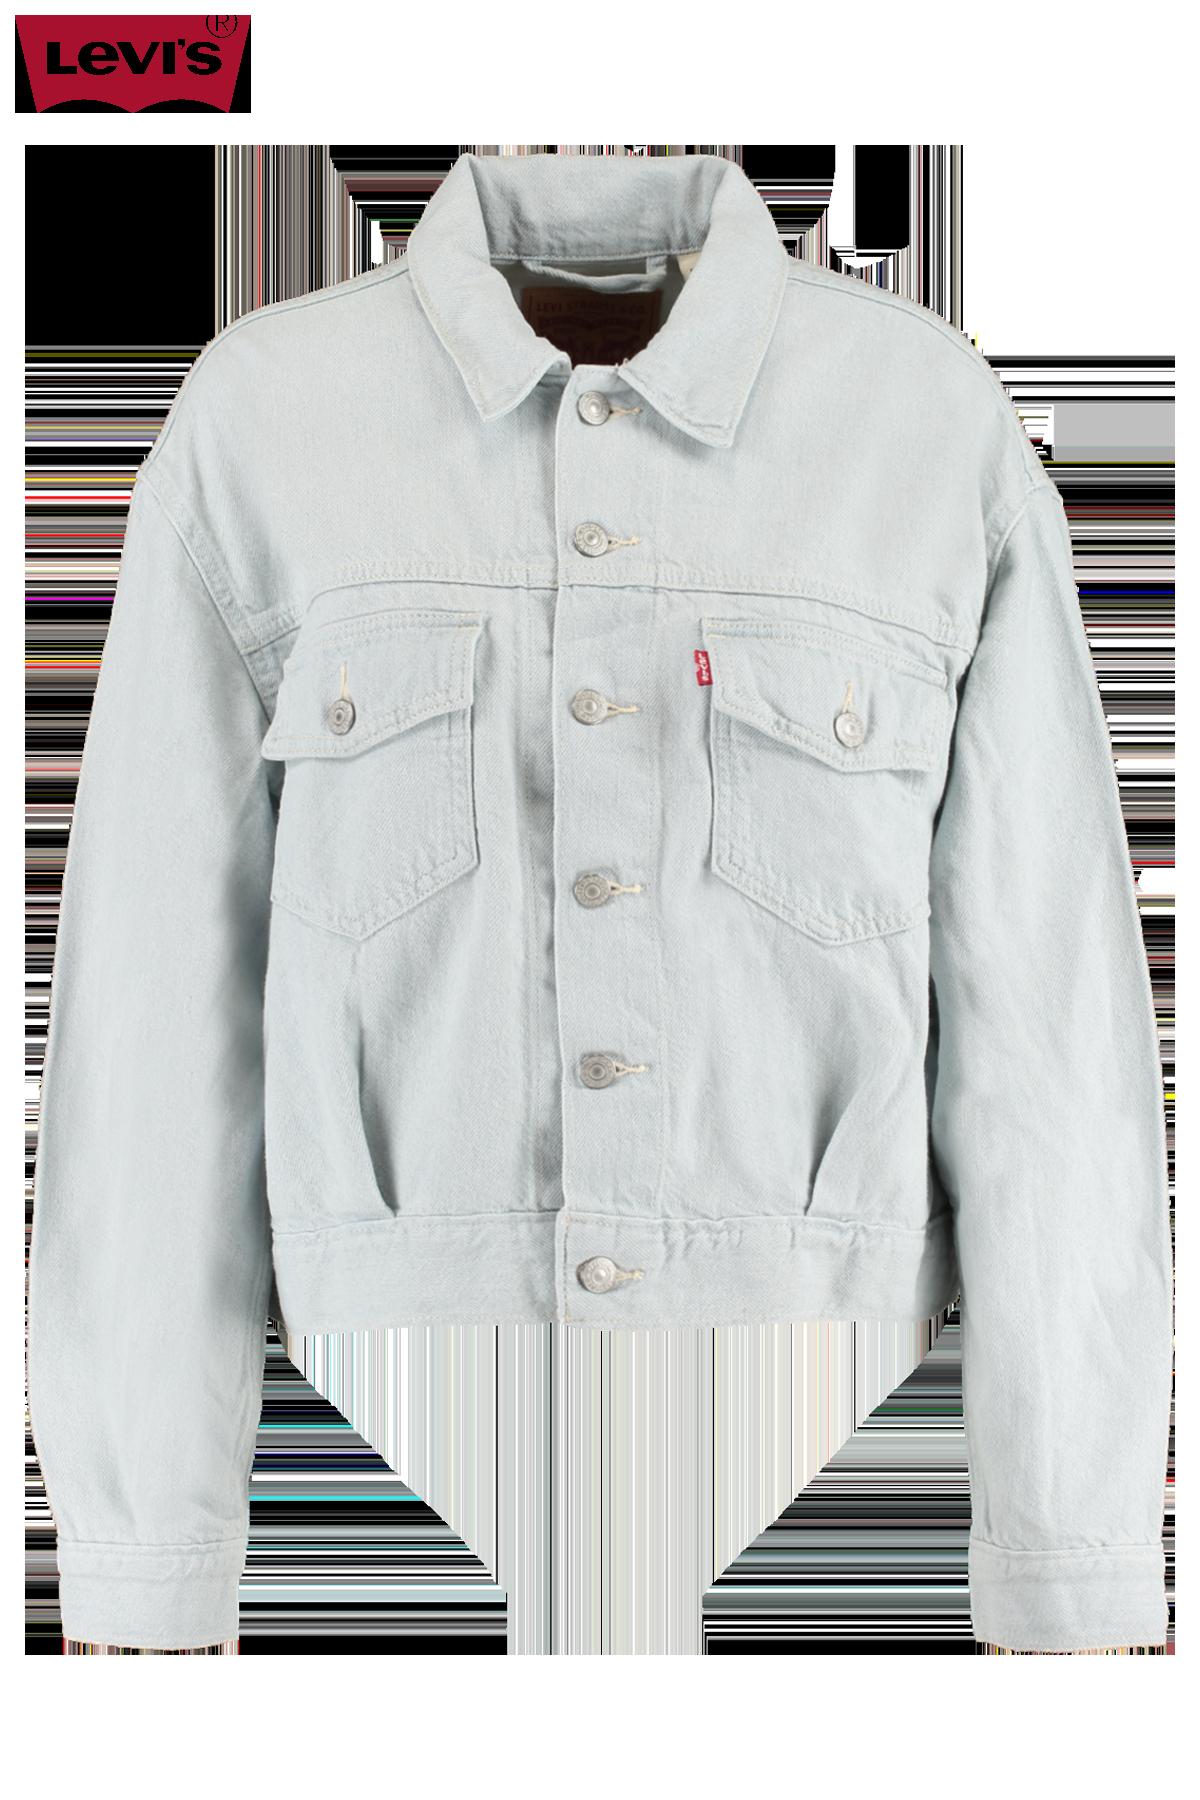 Denim jacket Oversized utility trucker